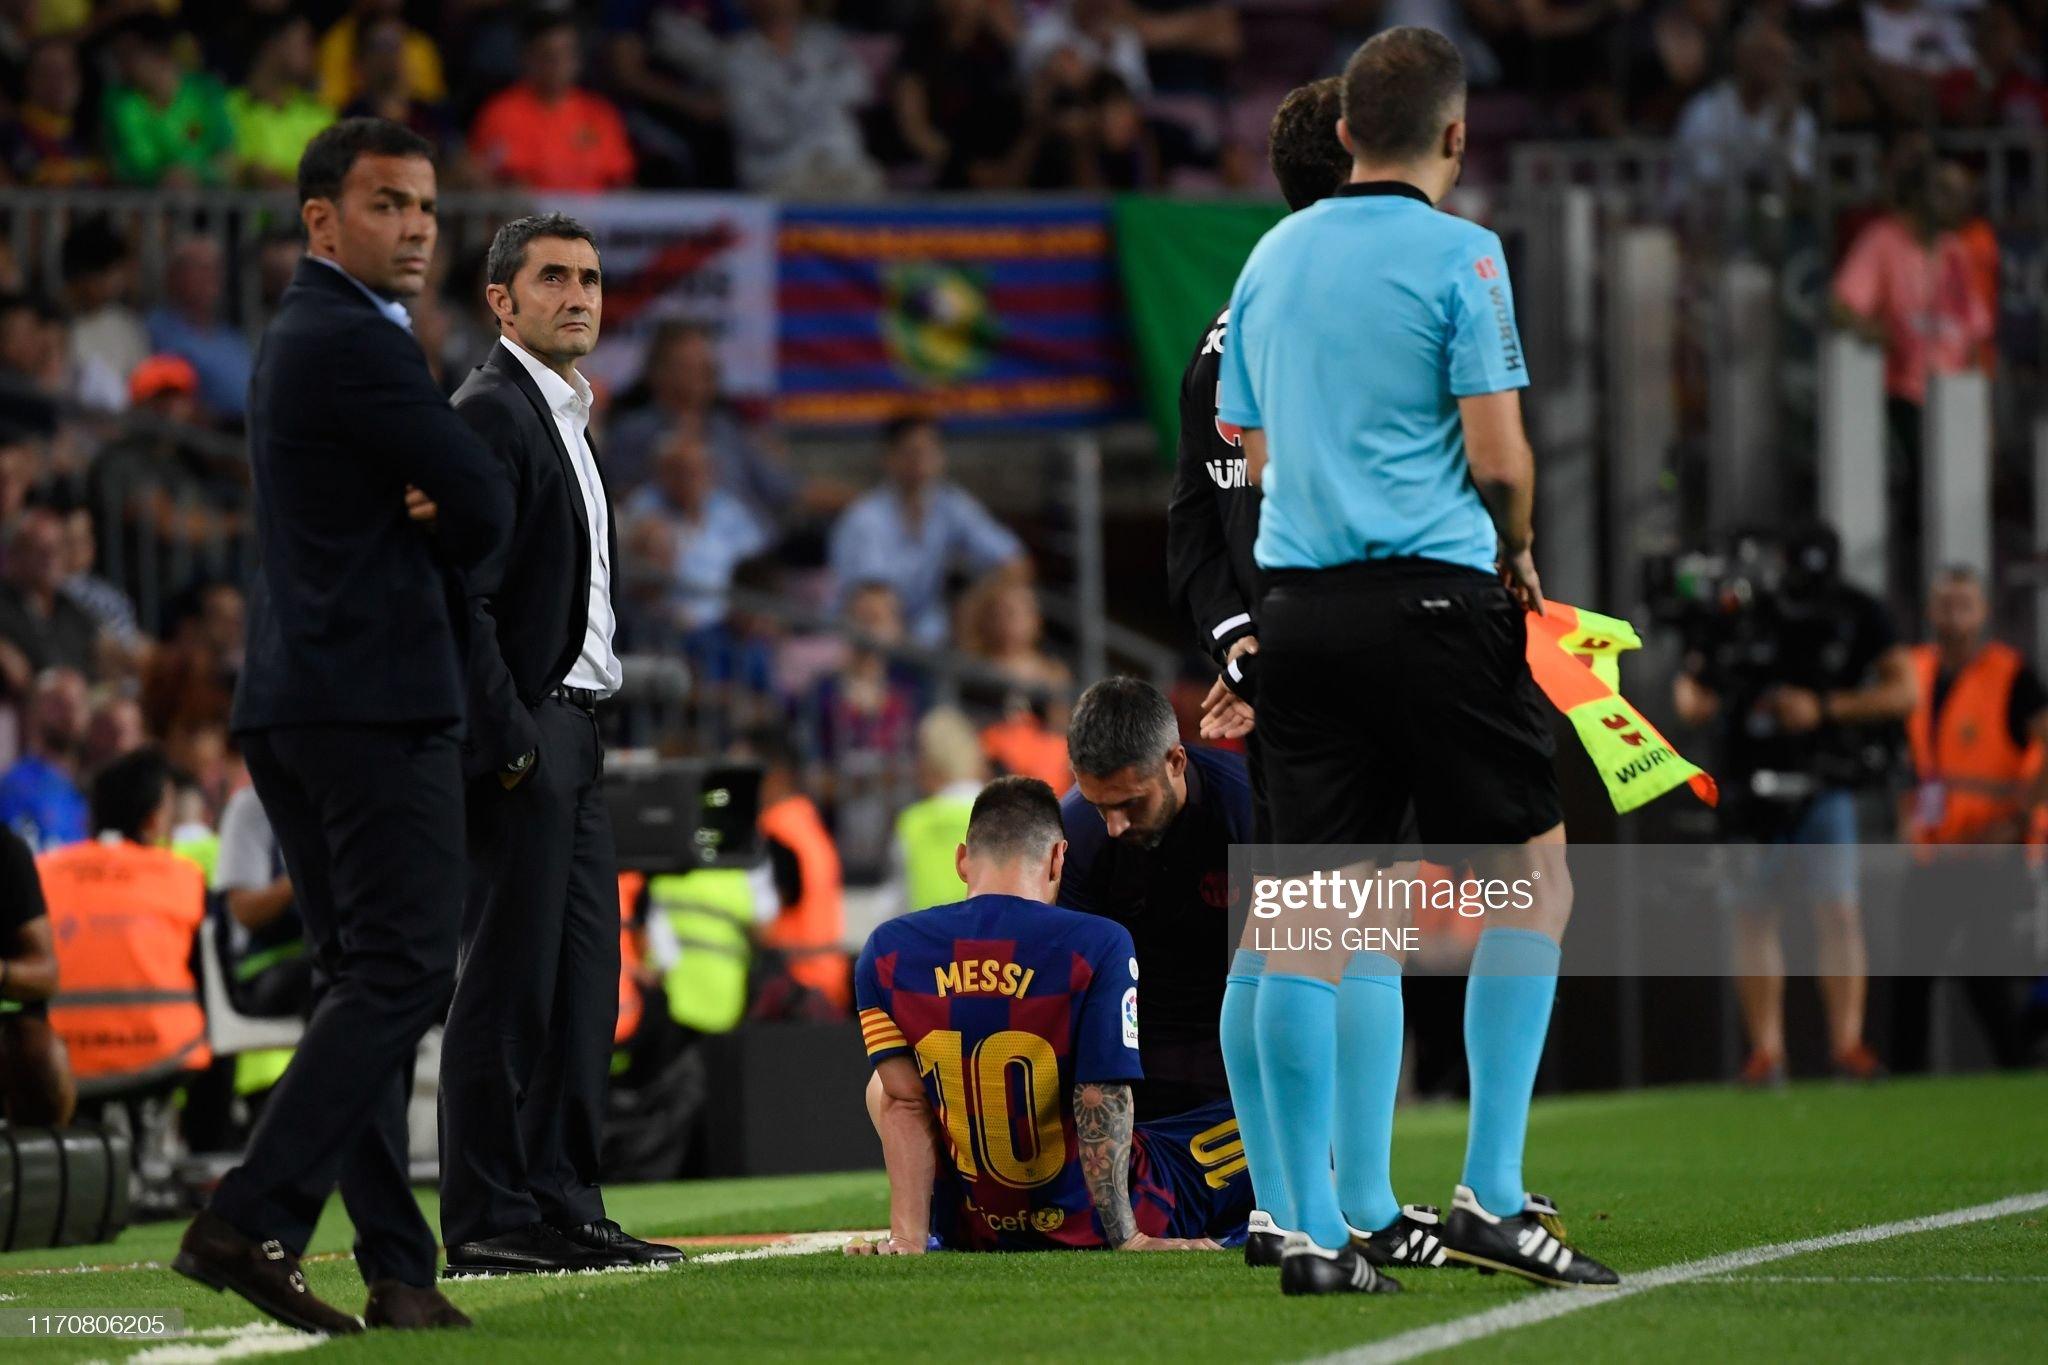 صور مباراة : برشلونة - فياريال 2-1 ( 24-09-2019 )  Barcelonas-argentine-forward-lionel-messi-is-treated-by-medical-staff-picture-id1170806205?s=2048x2048